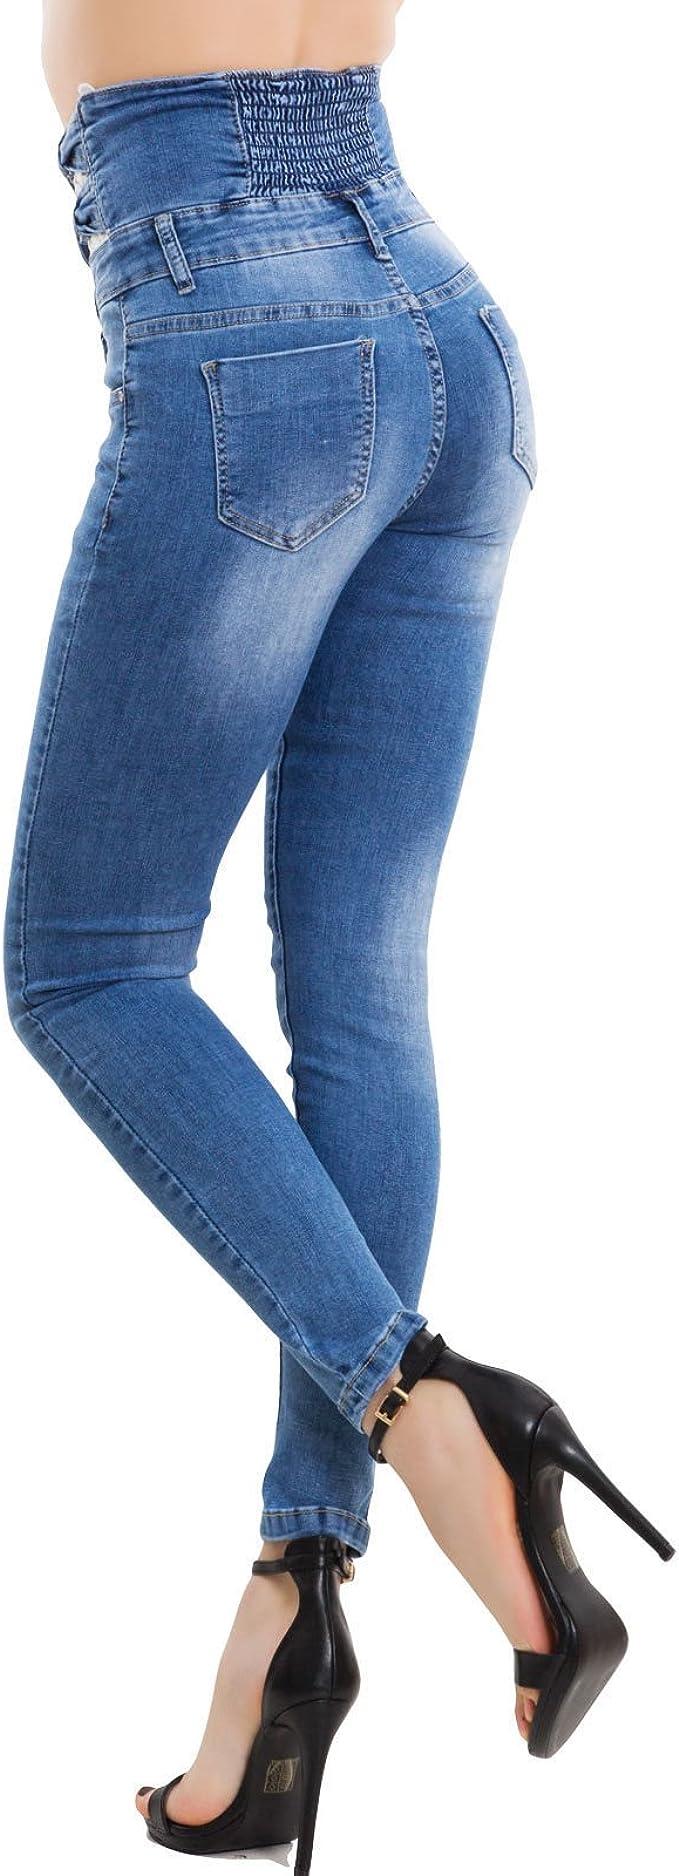 Jeans donna pantaloni skinny vita alta elasticizzati slim pizzo nuovi M5875